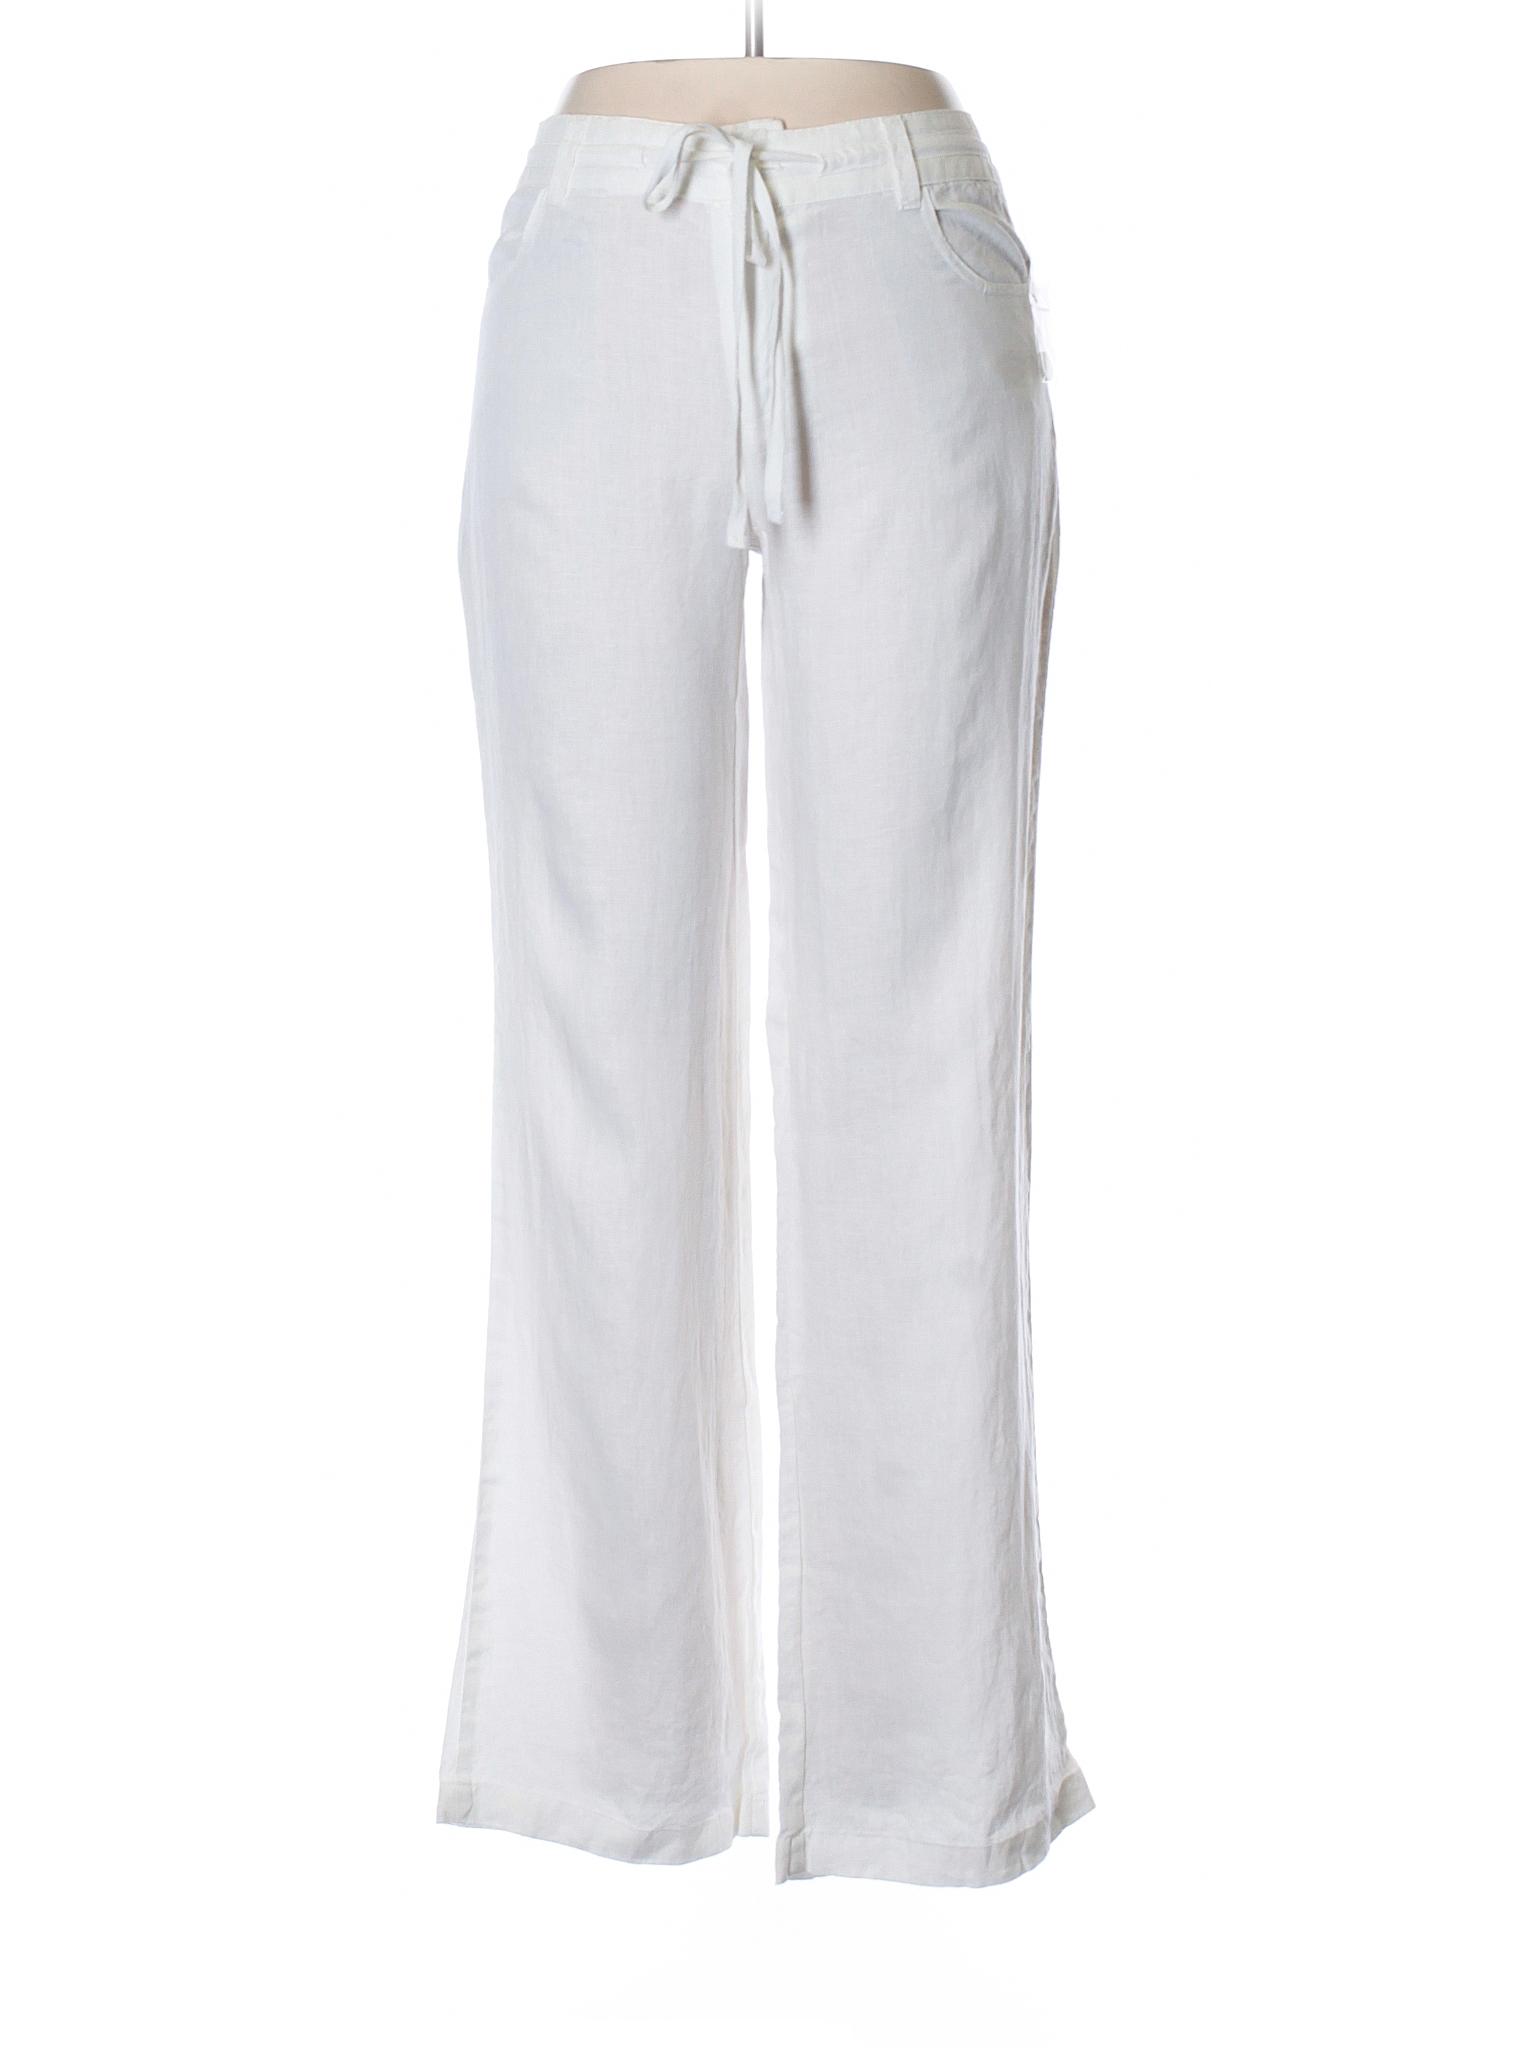 Cynthia Rowley Tjx 100 Linen Solid White Linen Pants Size